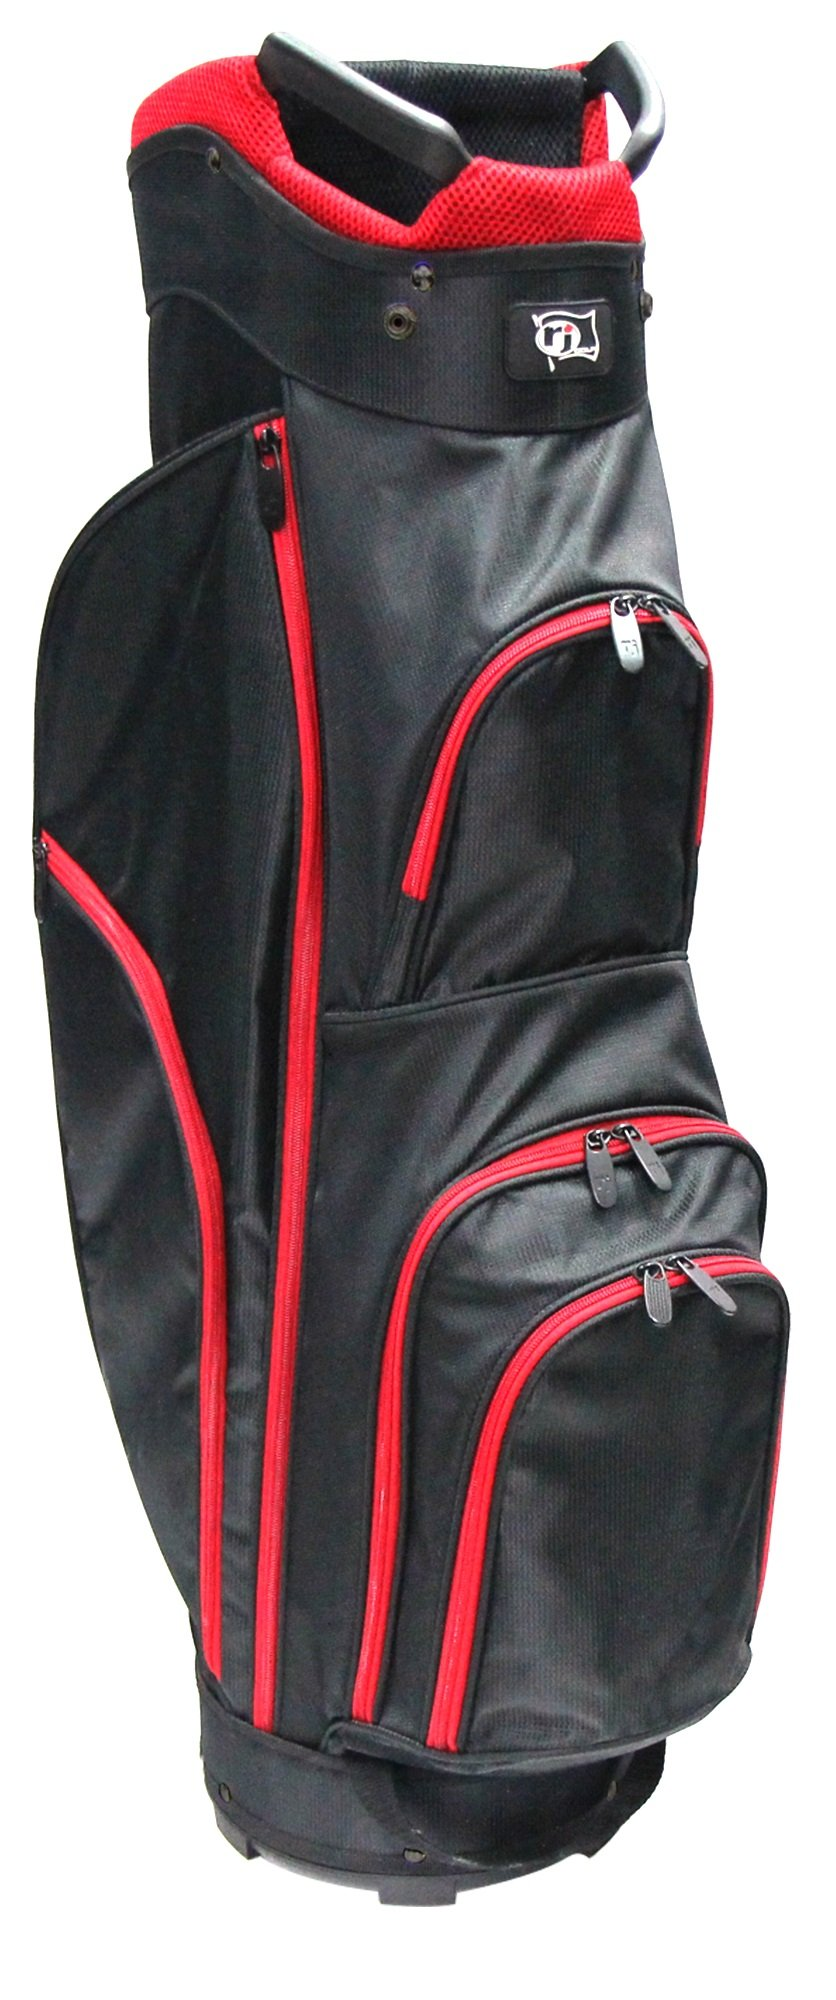 RJ Sports CC-490 Starter Bag, 9'', Black/Red